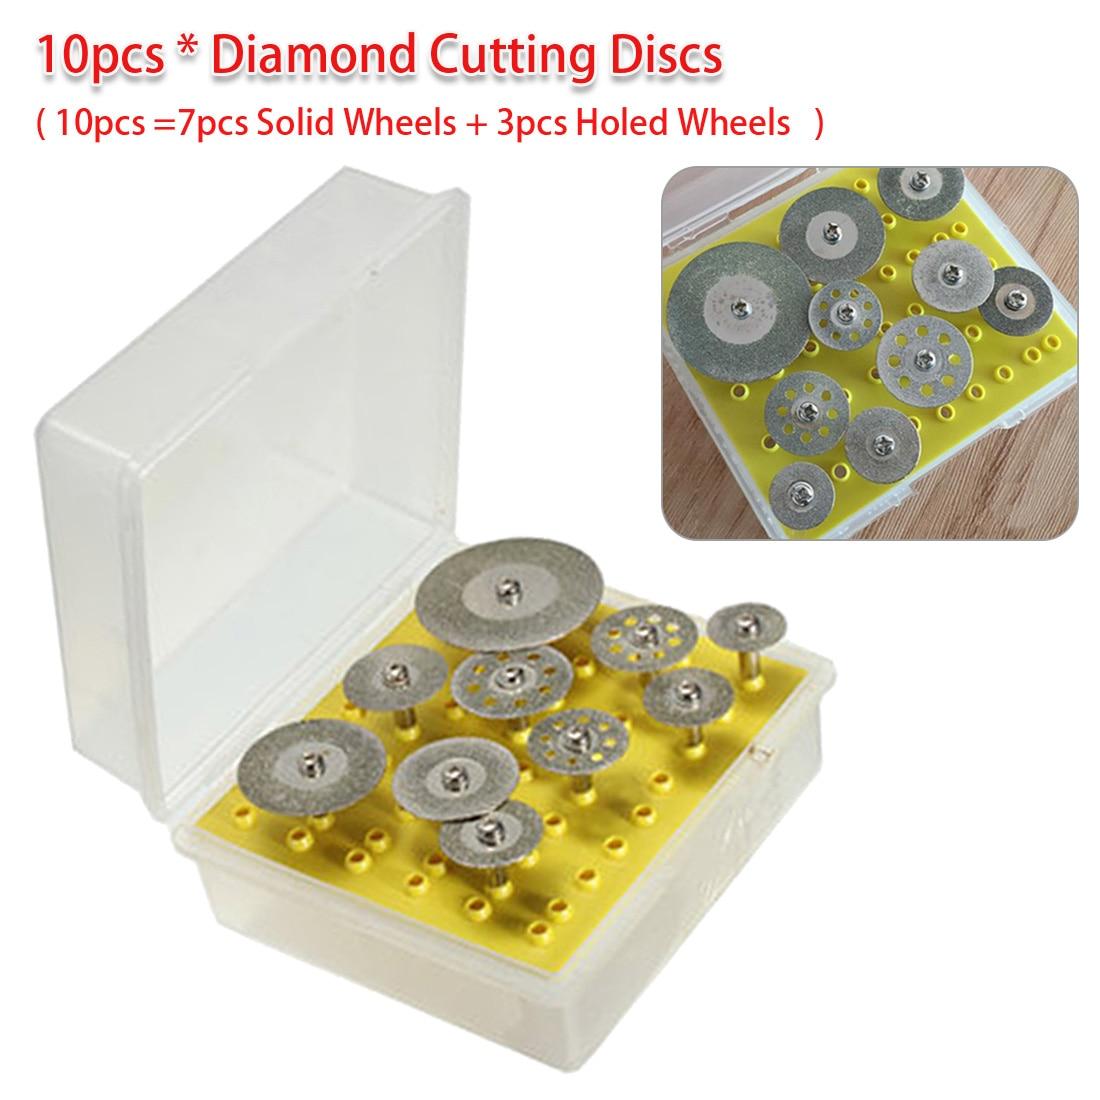 Cut-off Hold Wheel Set 10pcs/set Diamond Cutting Discs For Dremel Rotary Tool Cutting / Grinding / Engraving Tools